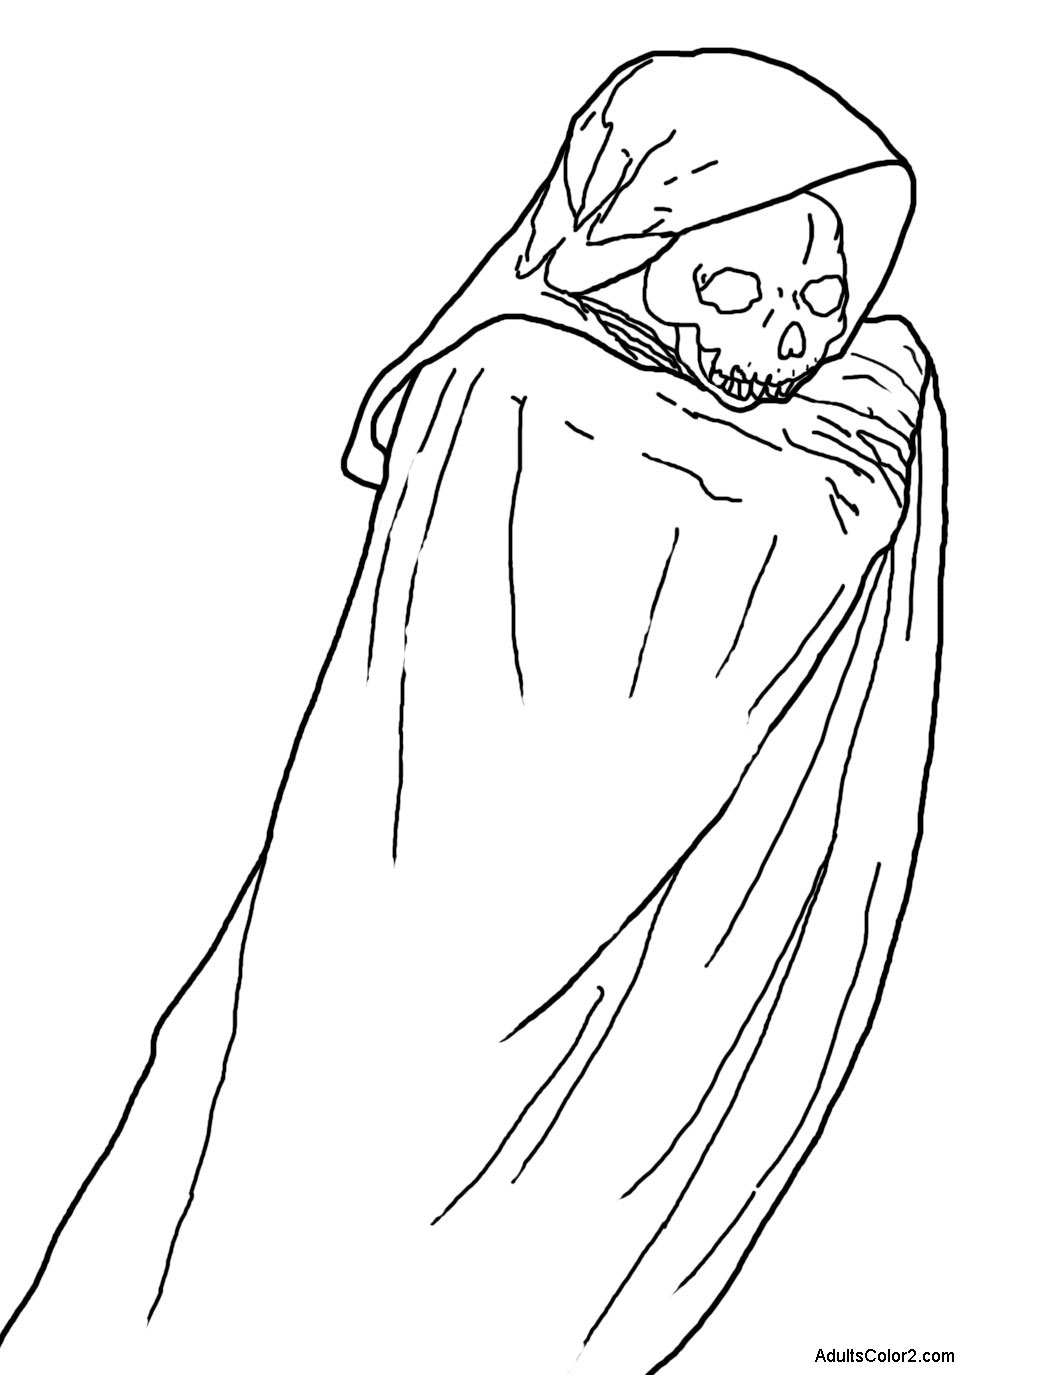 Phantom in a cape.